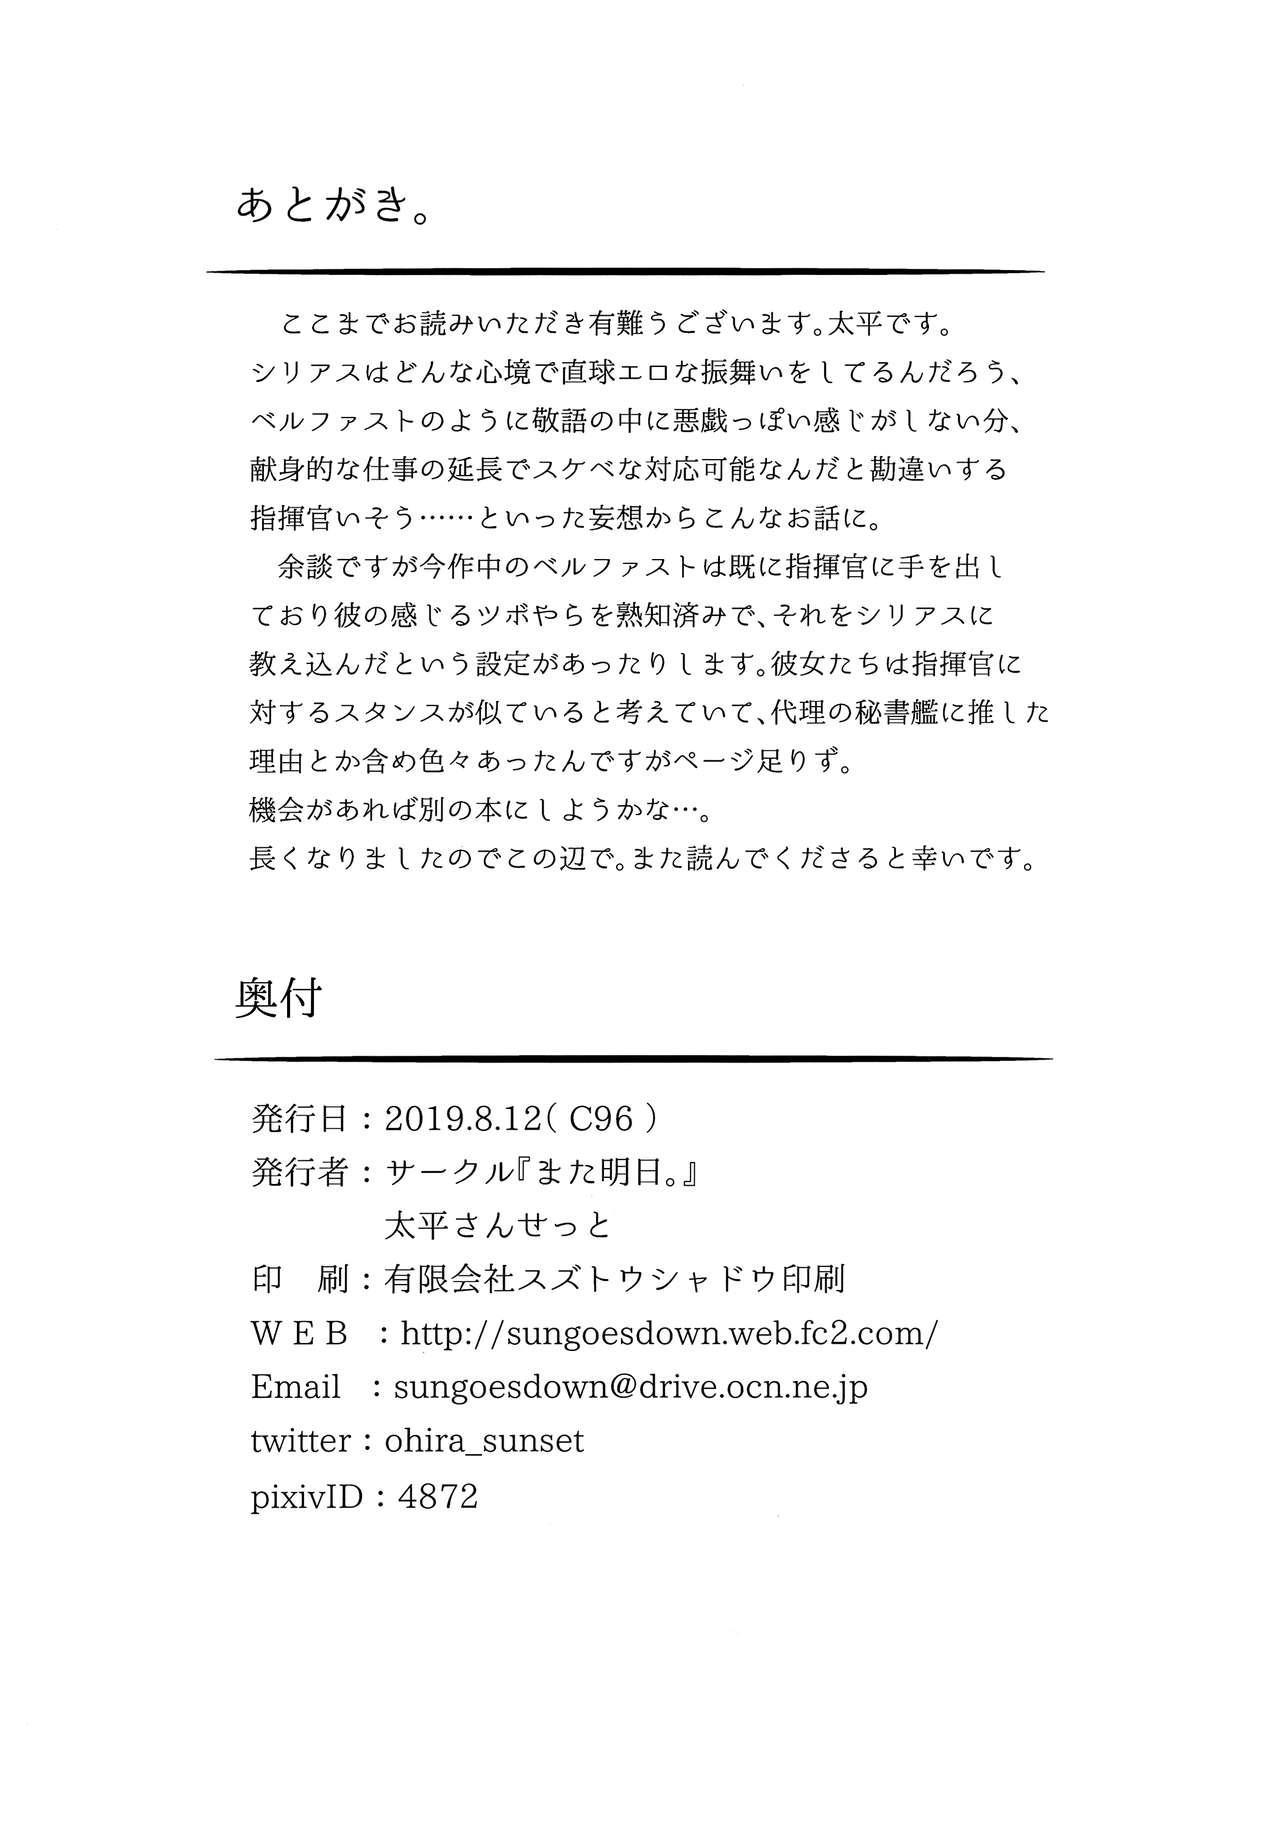 Yotogi wa Oshigoto ni Hairimasu ka? | Should I Add Attending You Through the Night as Part of My Duty? 23